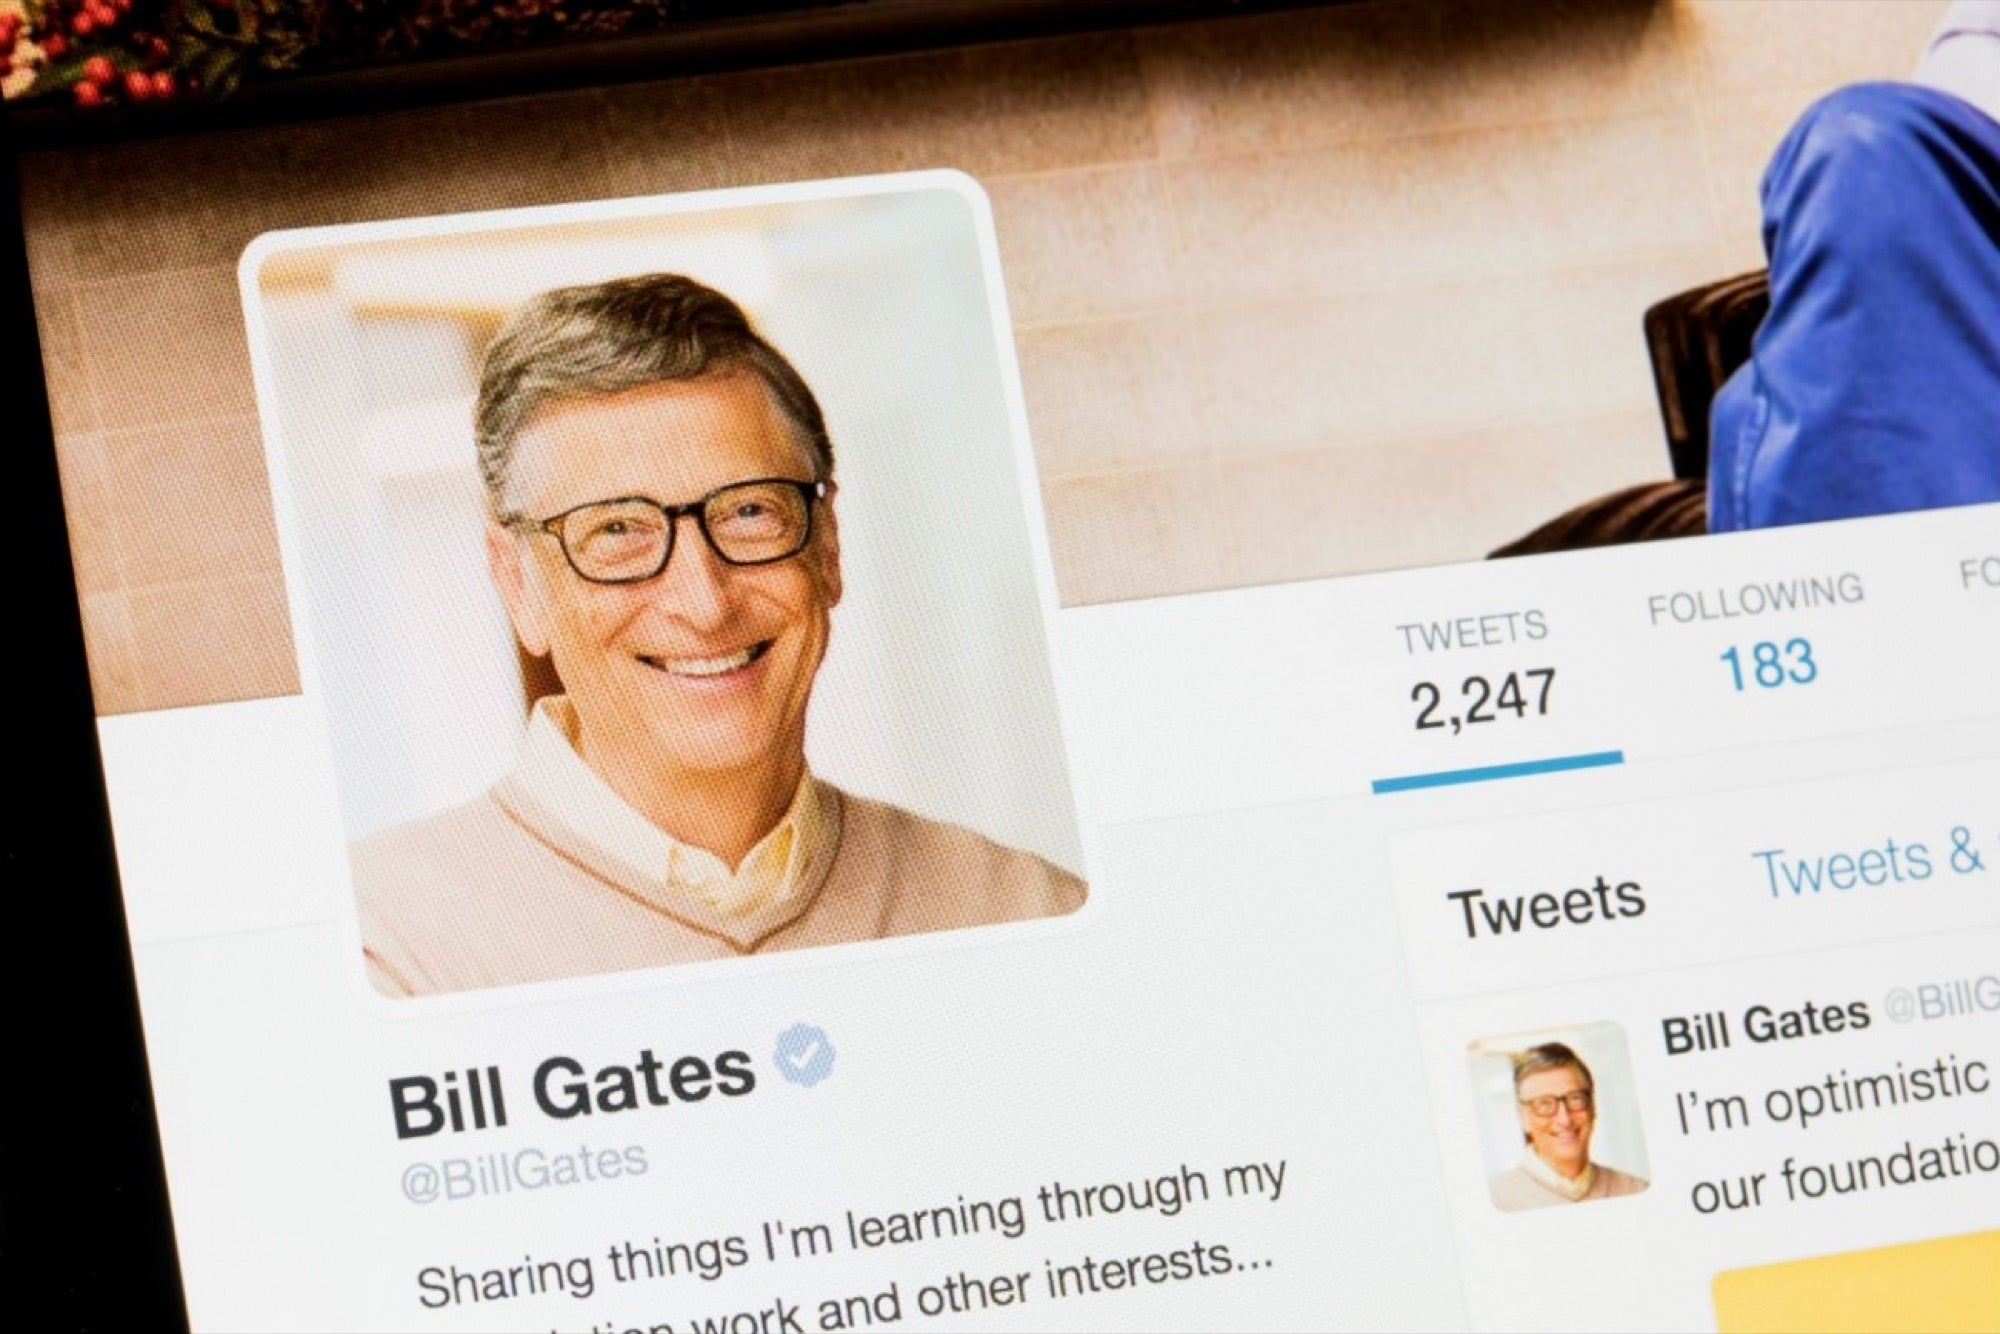 Frases celebres de grandes hombres de negocios